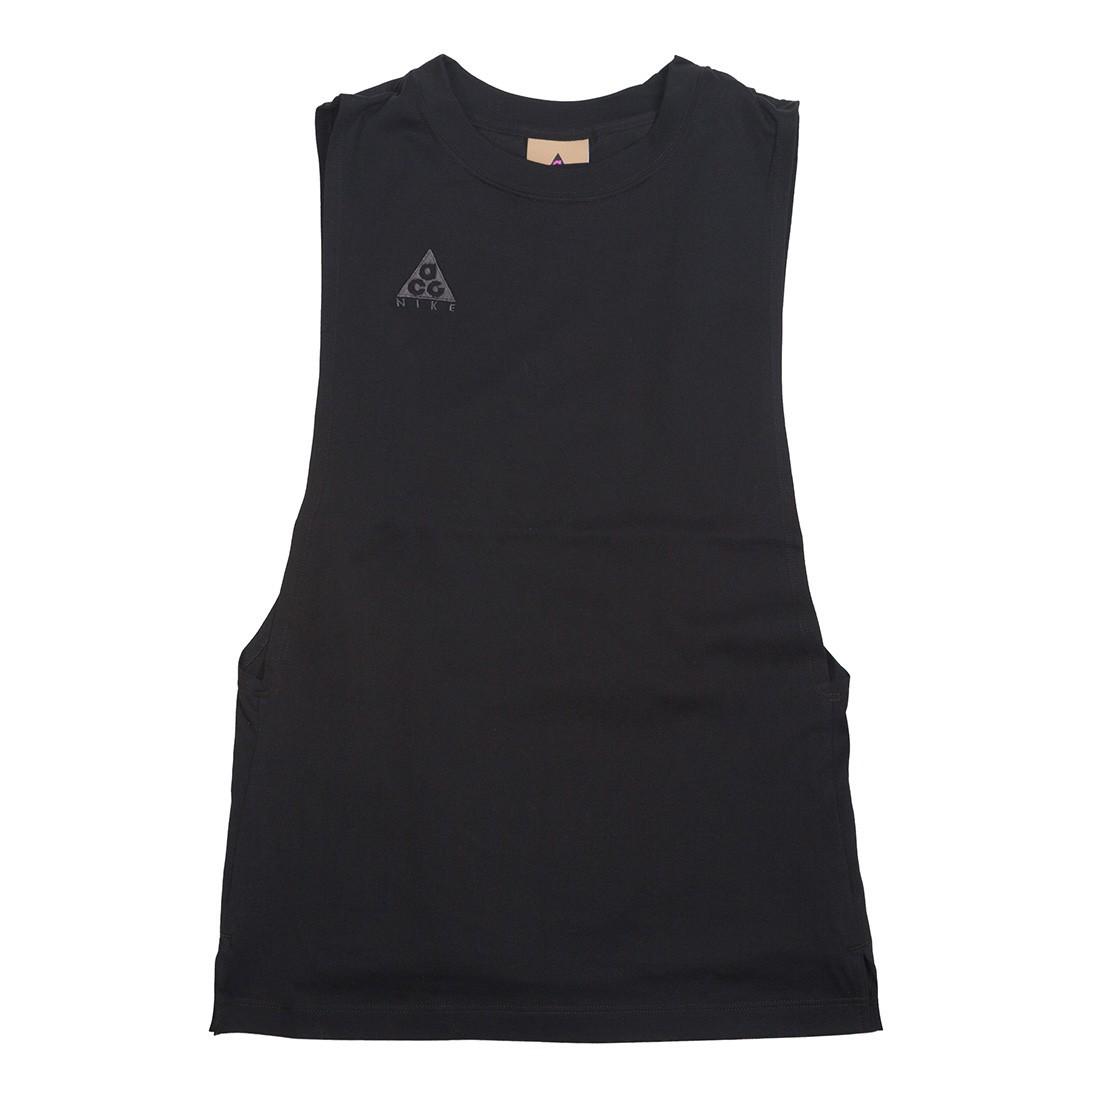 Nike Women Nrg Acg Tank Top (black / black / anthracite)